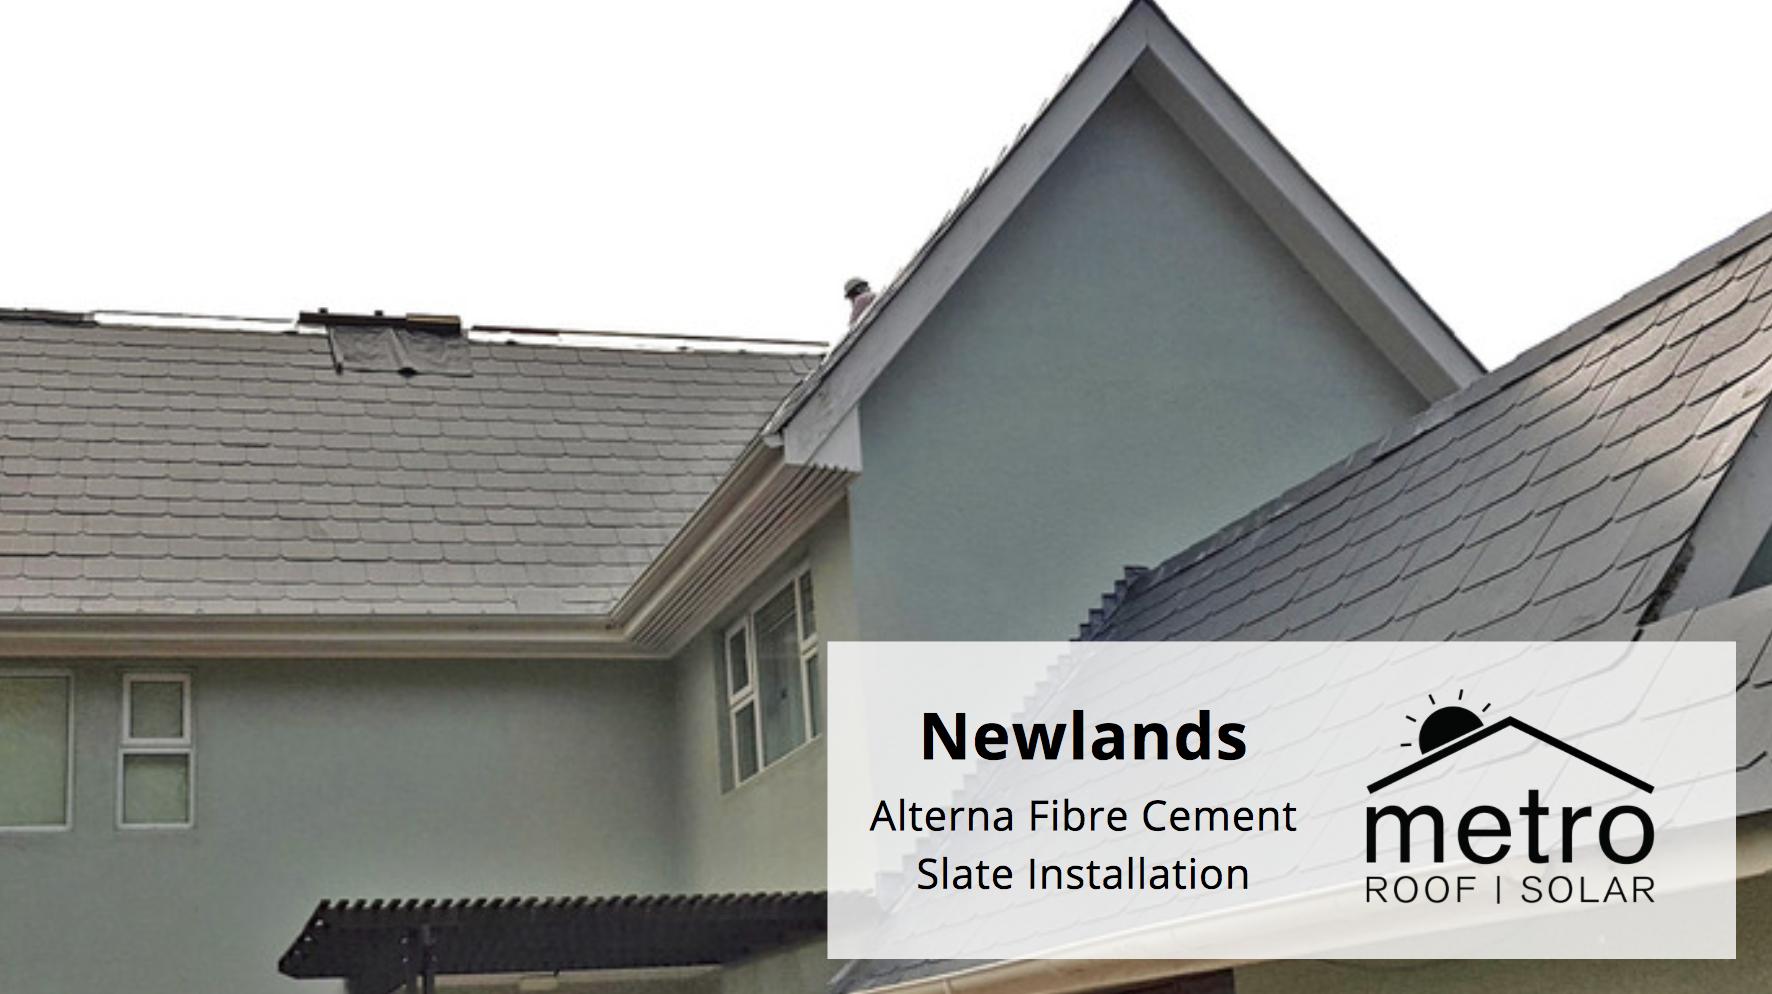 Alterna Fibre Cement Slate Installation